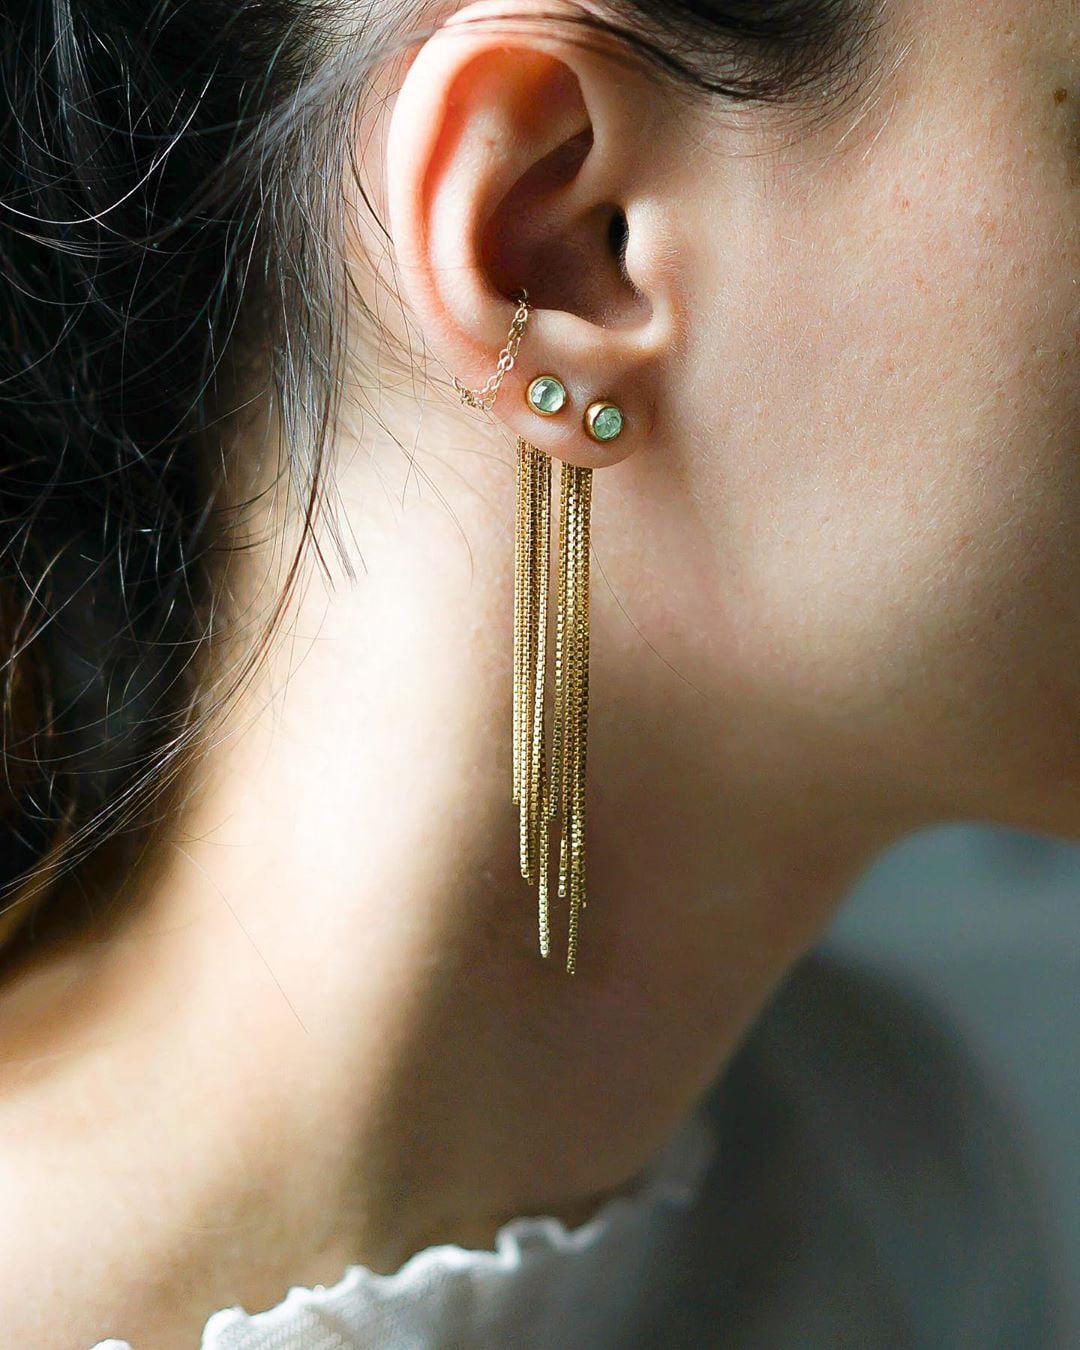 Golden earrings with a blue gem